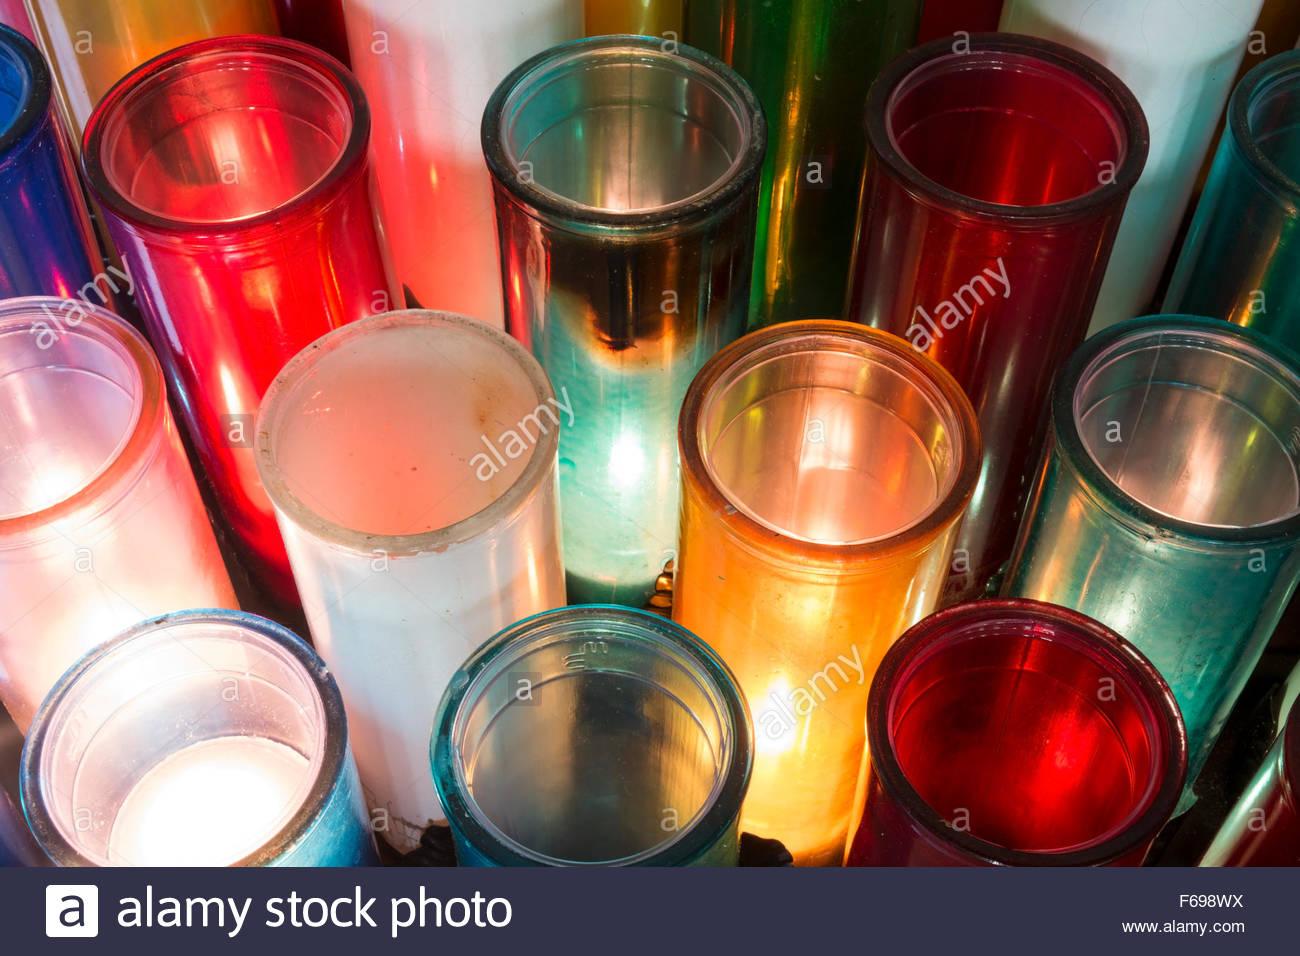 Devotion Candles at Baie-Saint-Paul Church, Baie-Saint-Paul, Quebec, Canada - Stock Image